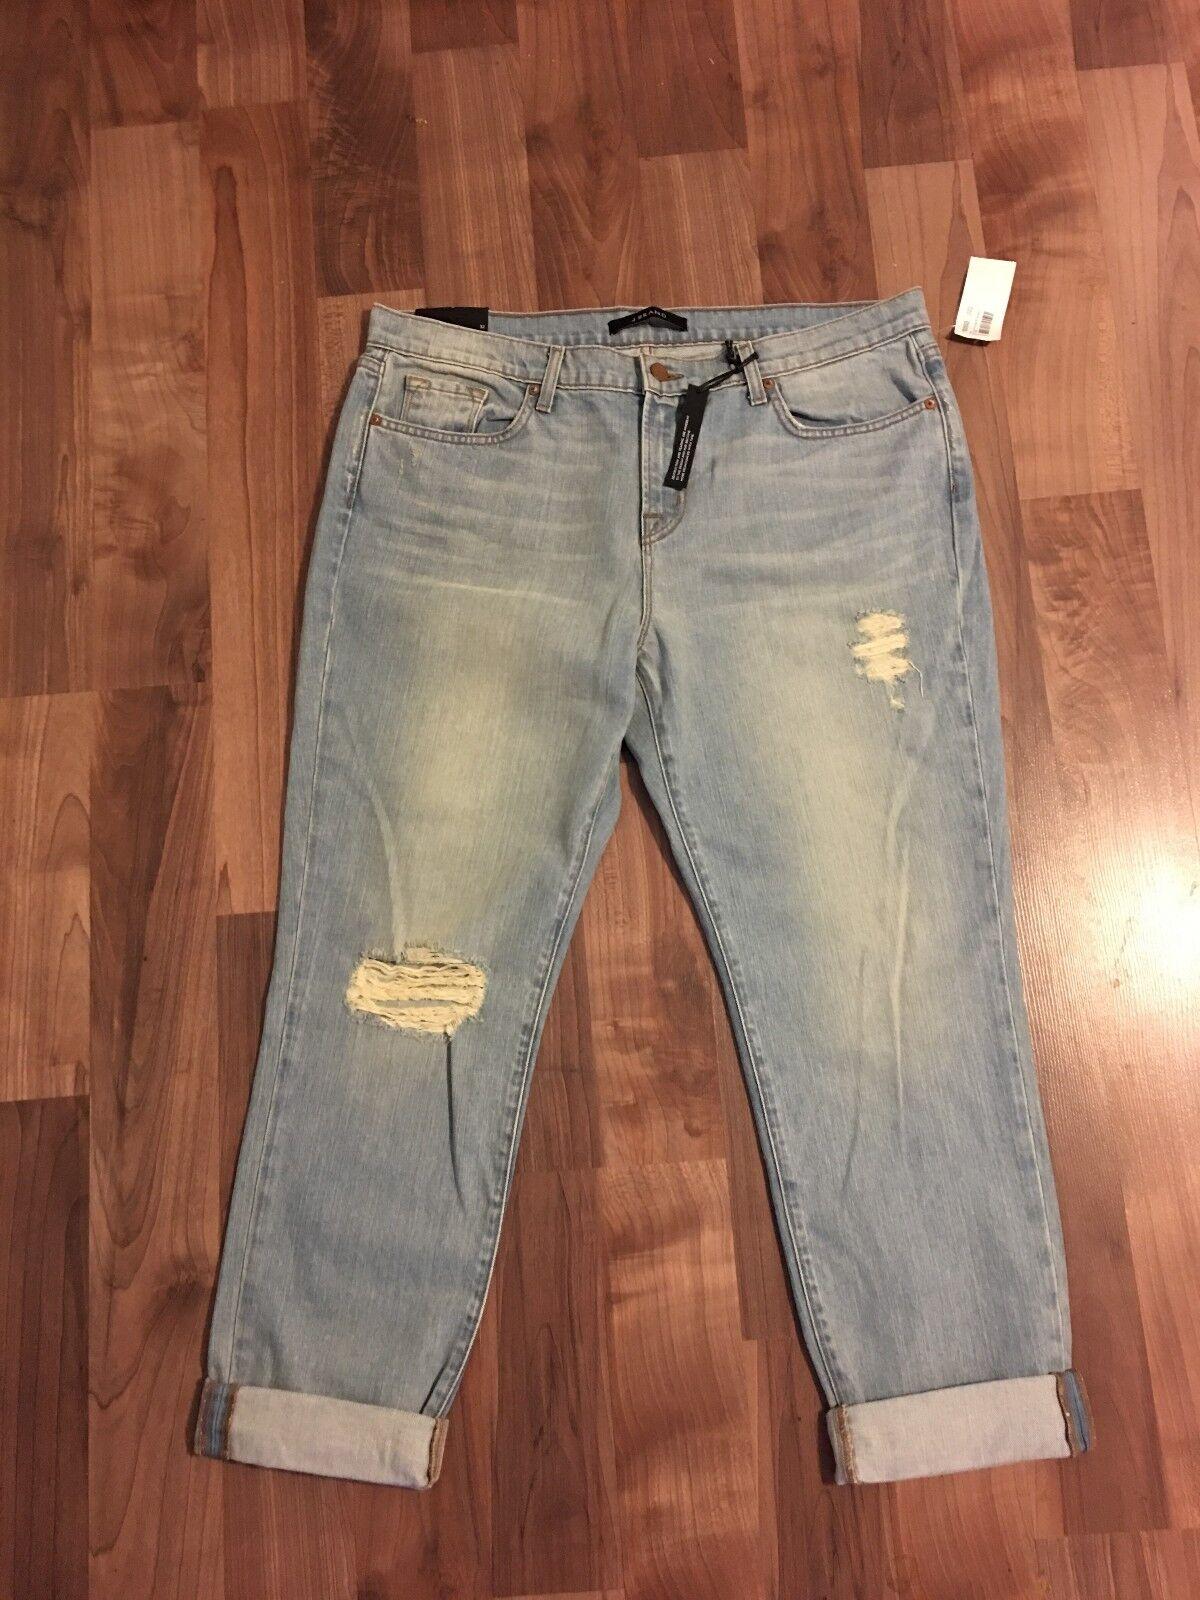 NWT J Brand Aidan Slouchy Boyfriend Jeans Women's Size 32 Light Wash Destroyed